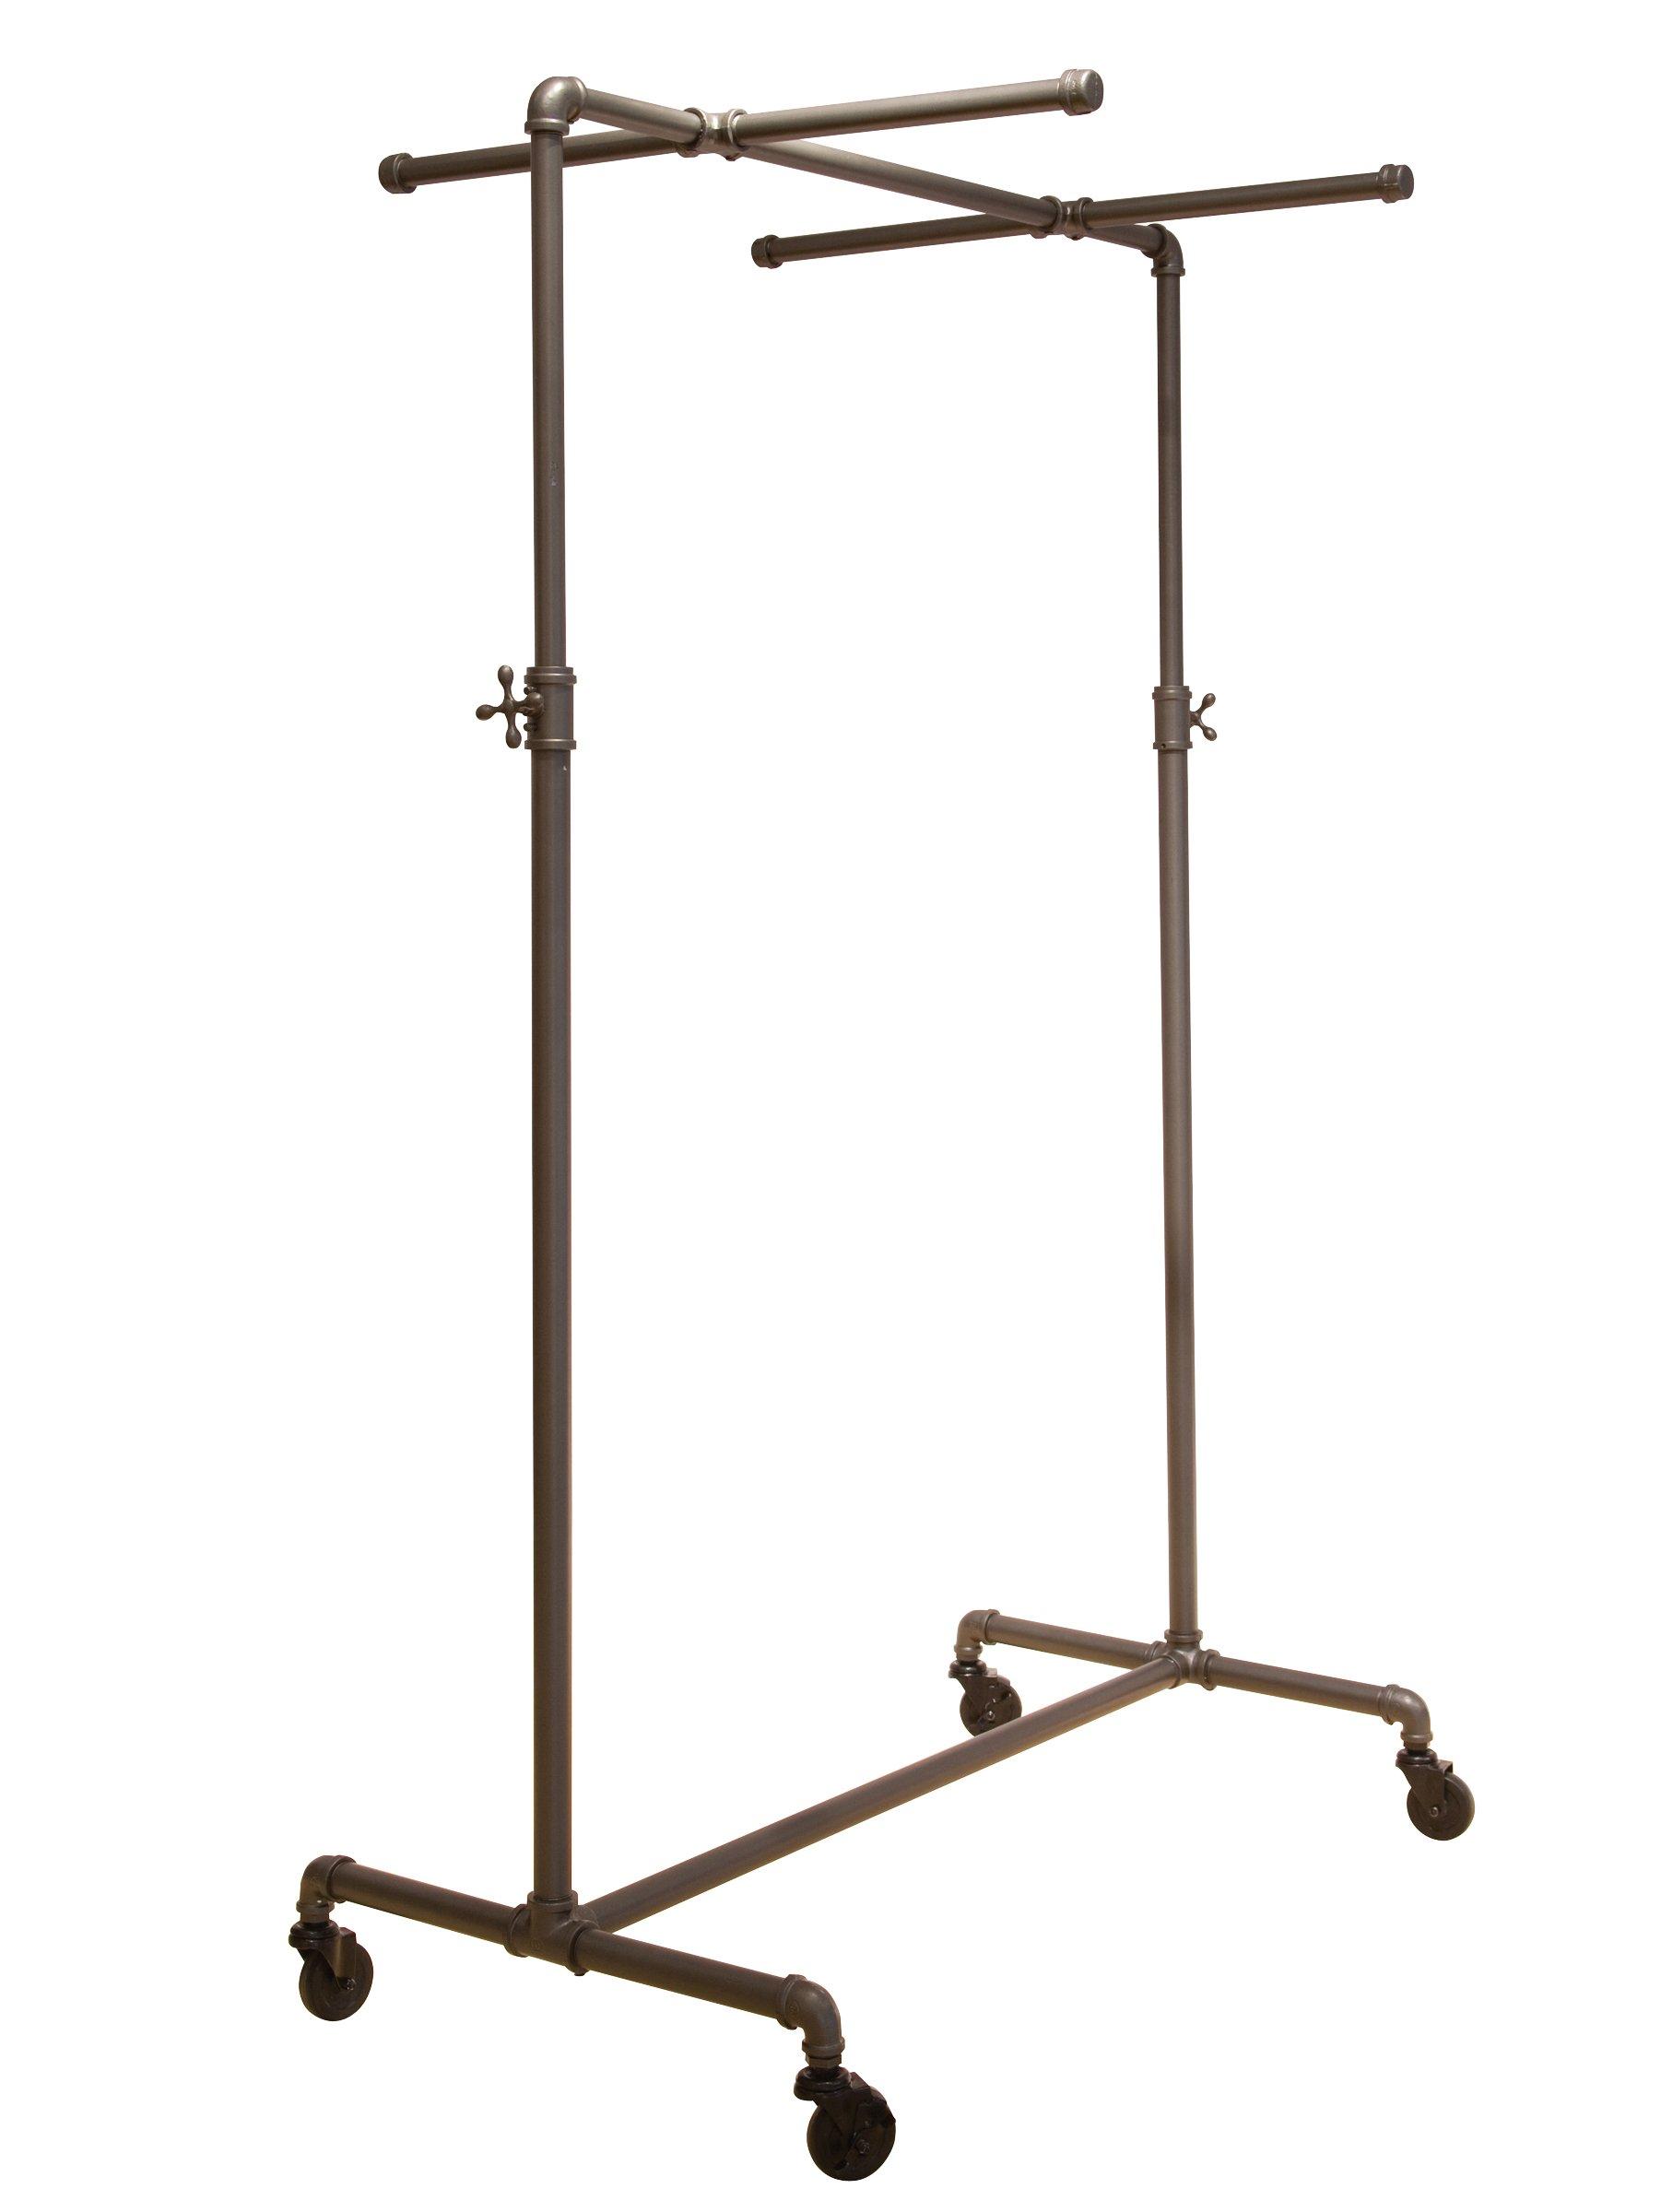 Econoco Pipeline Adjustable Ballet Rack with Two Cross Bars